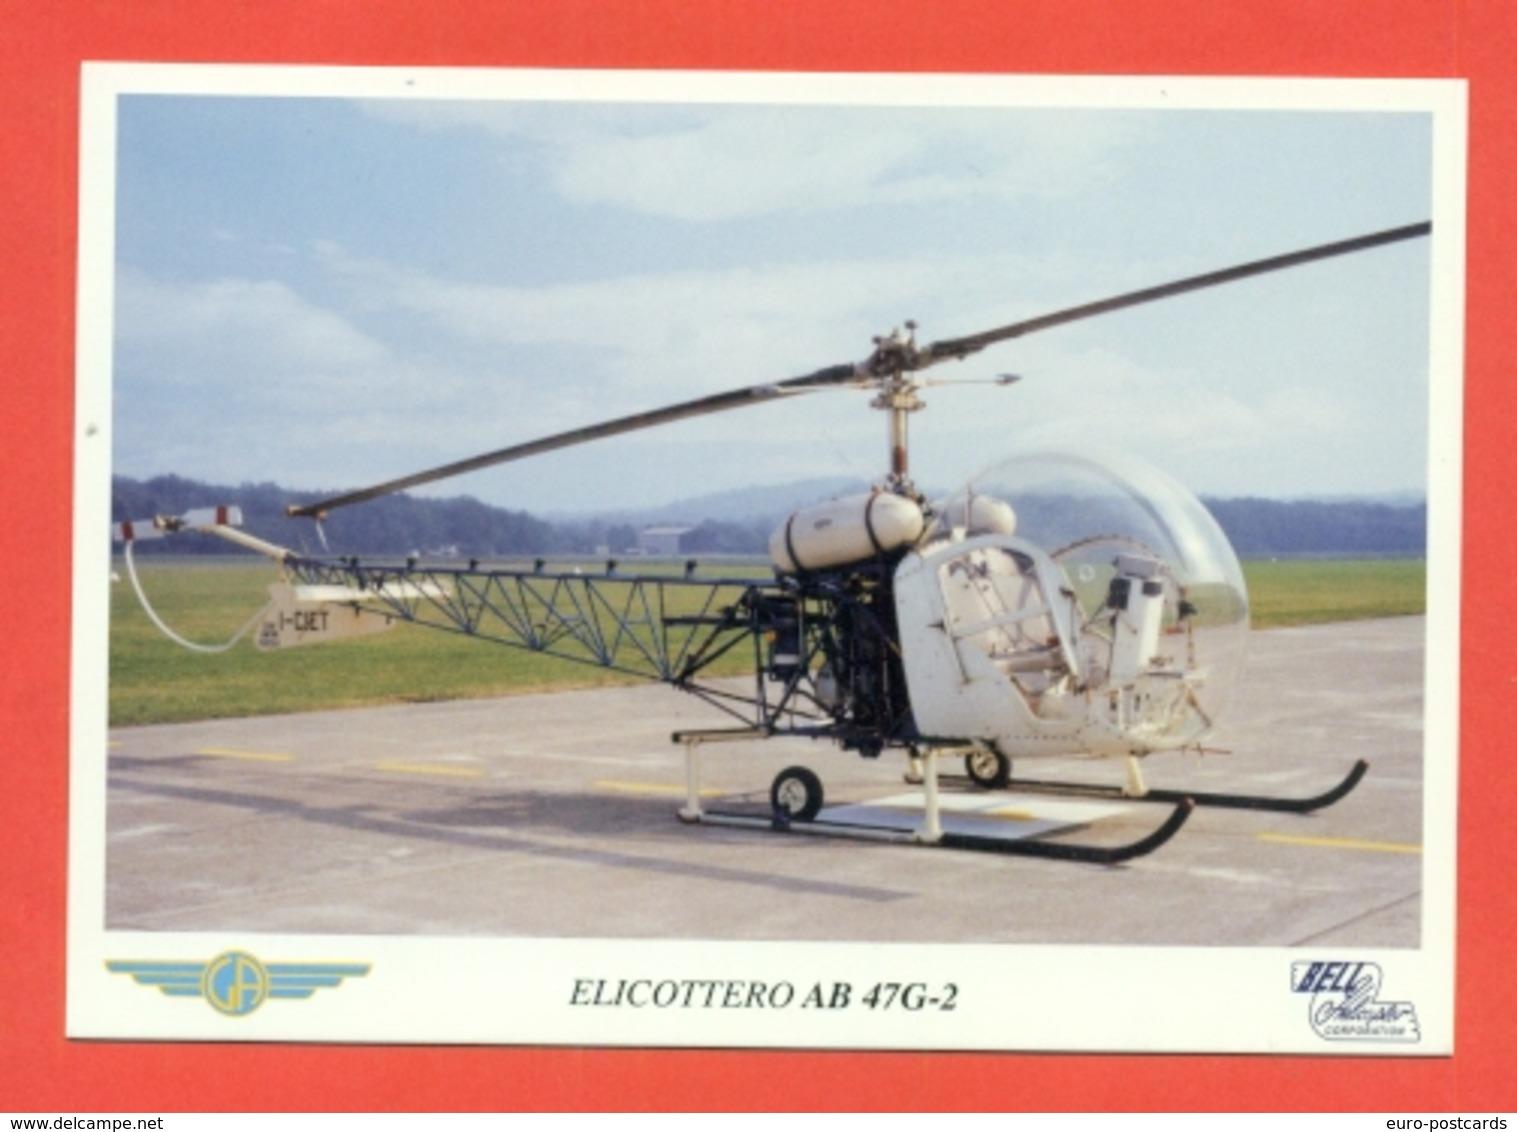 ELICOTTERI-AB 47G-2 -SAMARATE-MUSEO AGUSTA - MARCOFILIA - Elicotteri